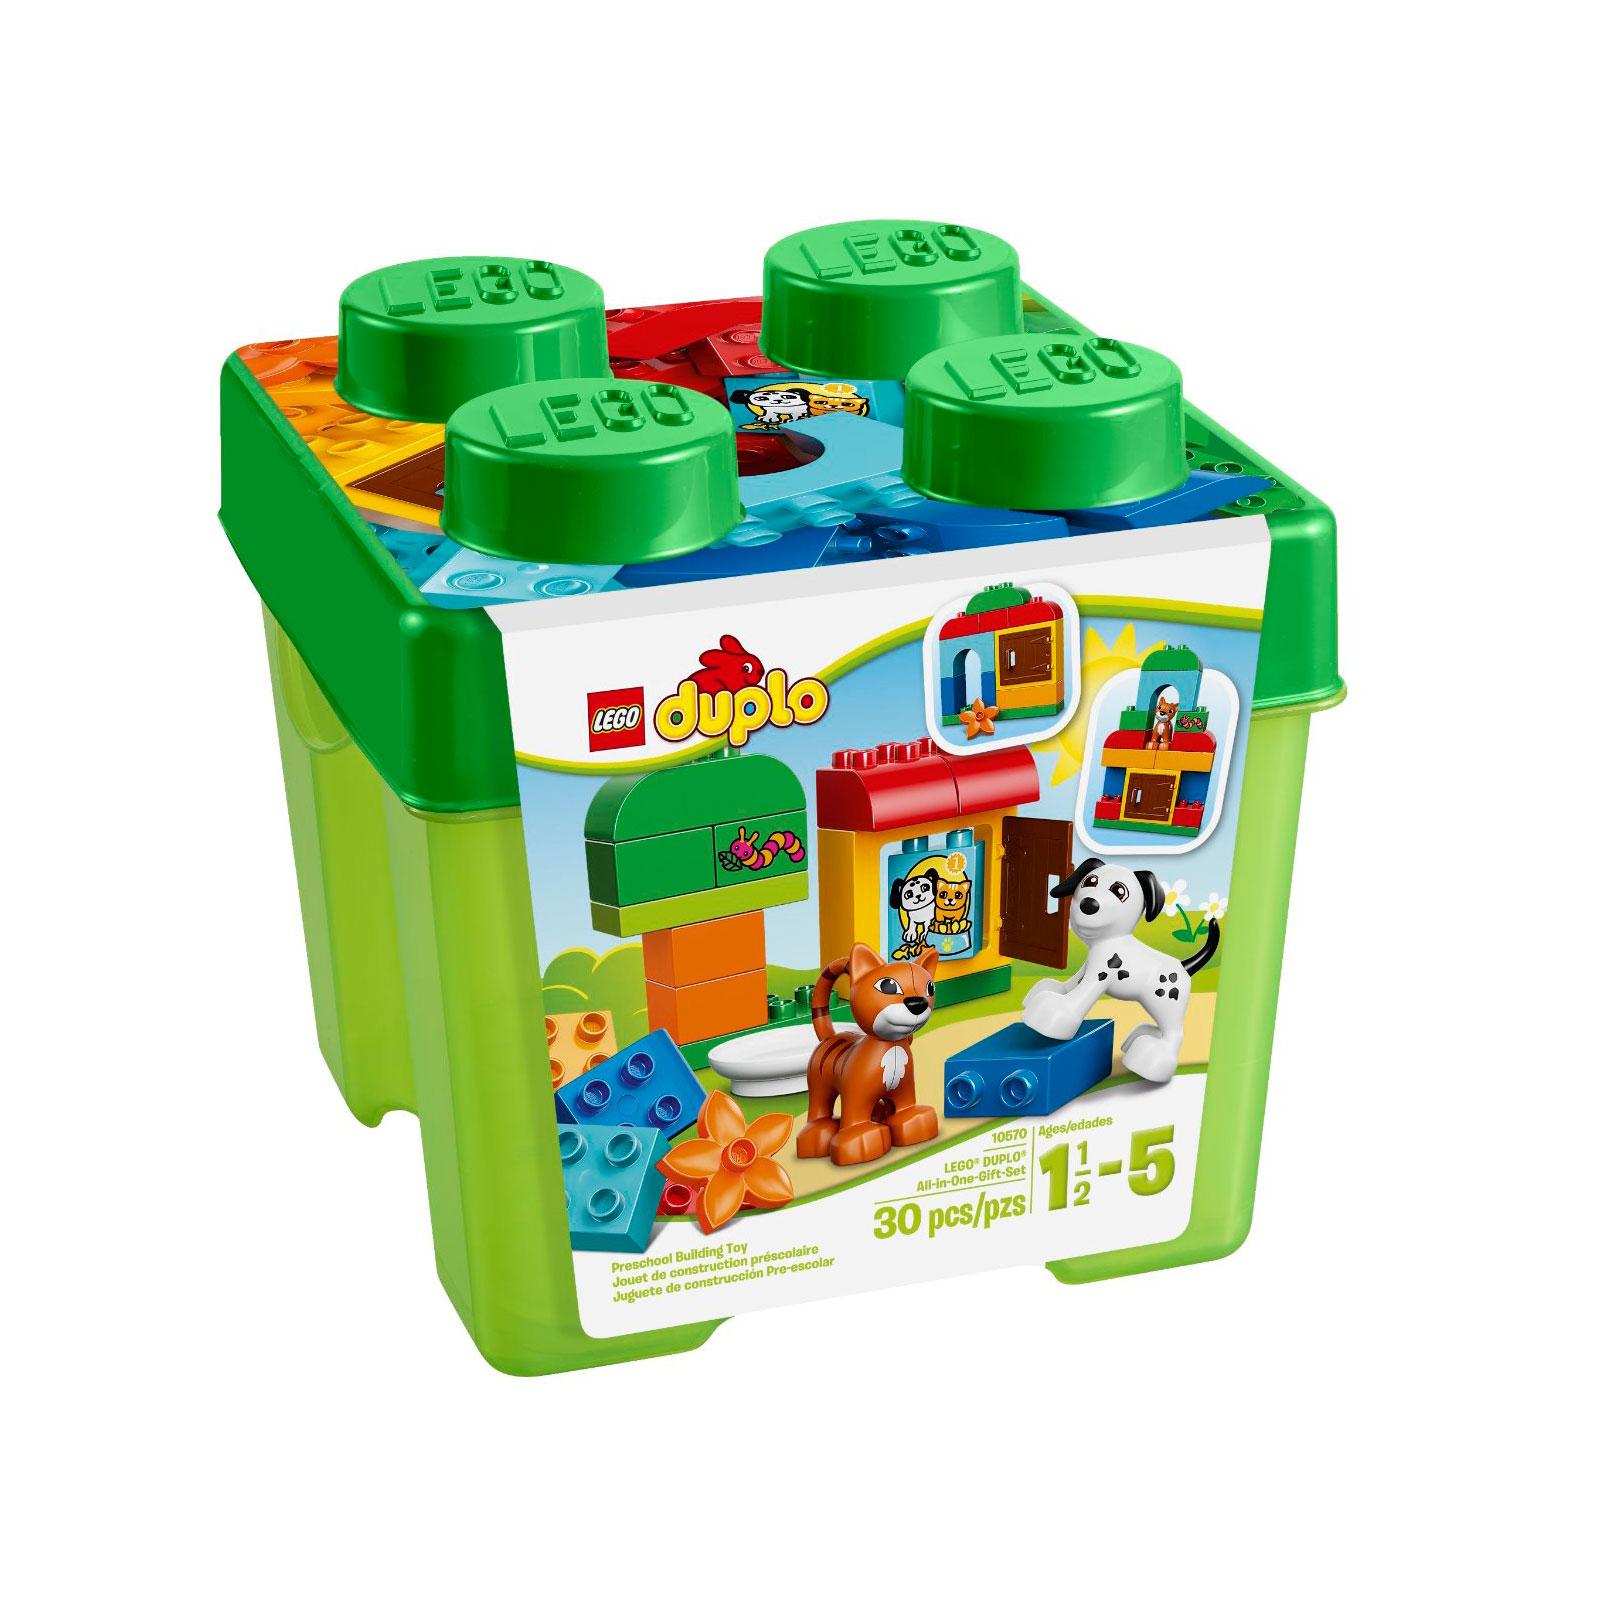 ����������� LEGO Duplo 10570 ������ ������: ��� � ��